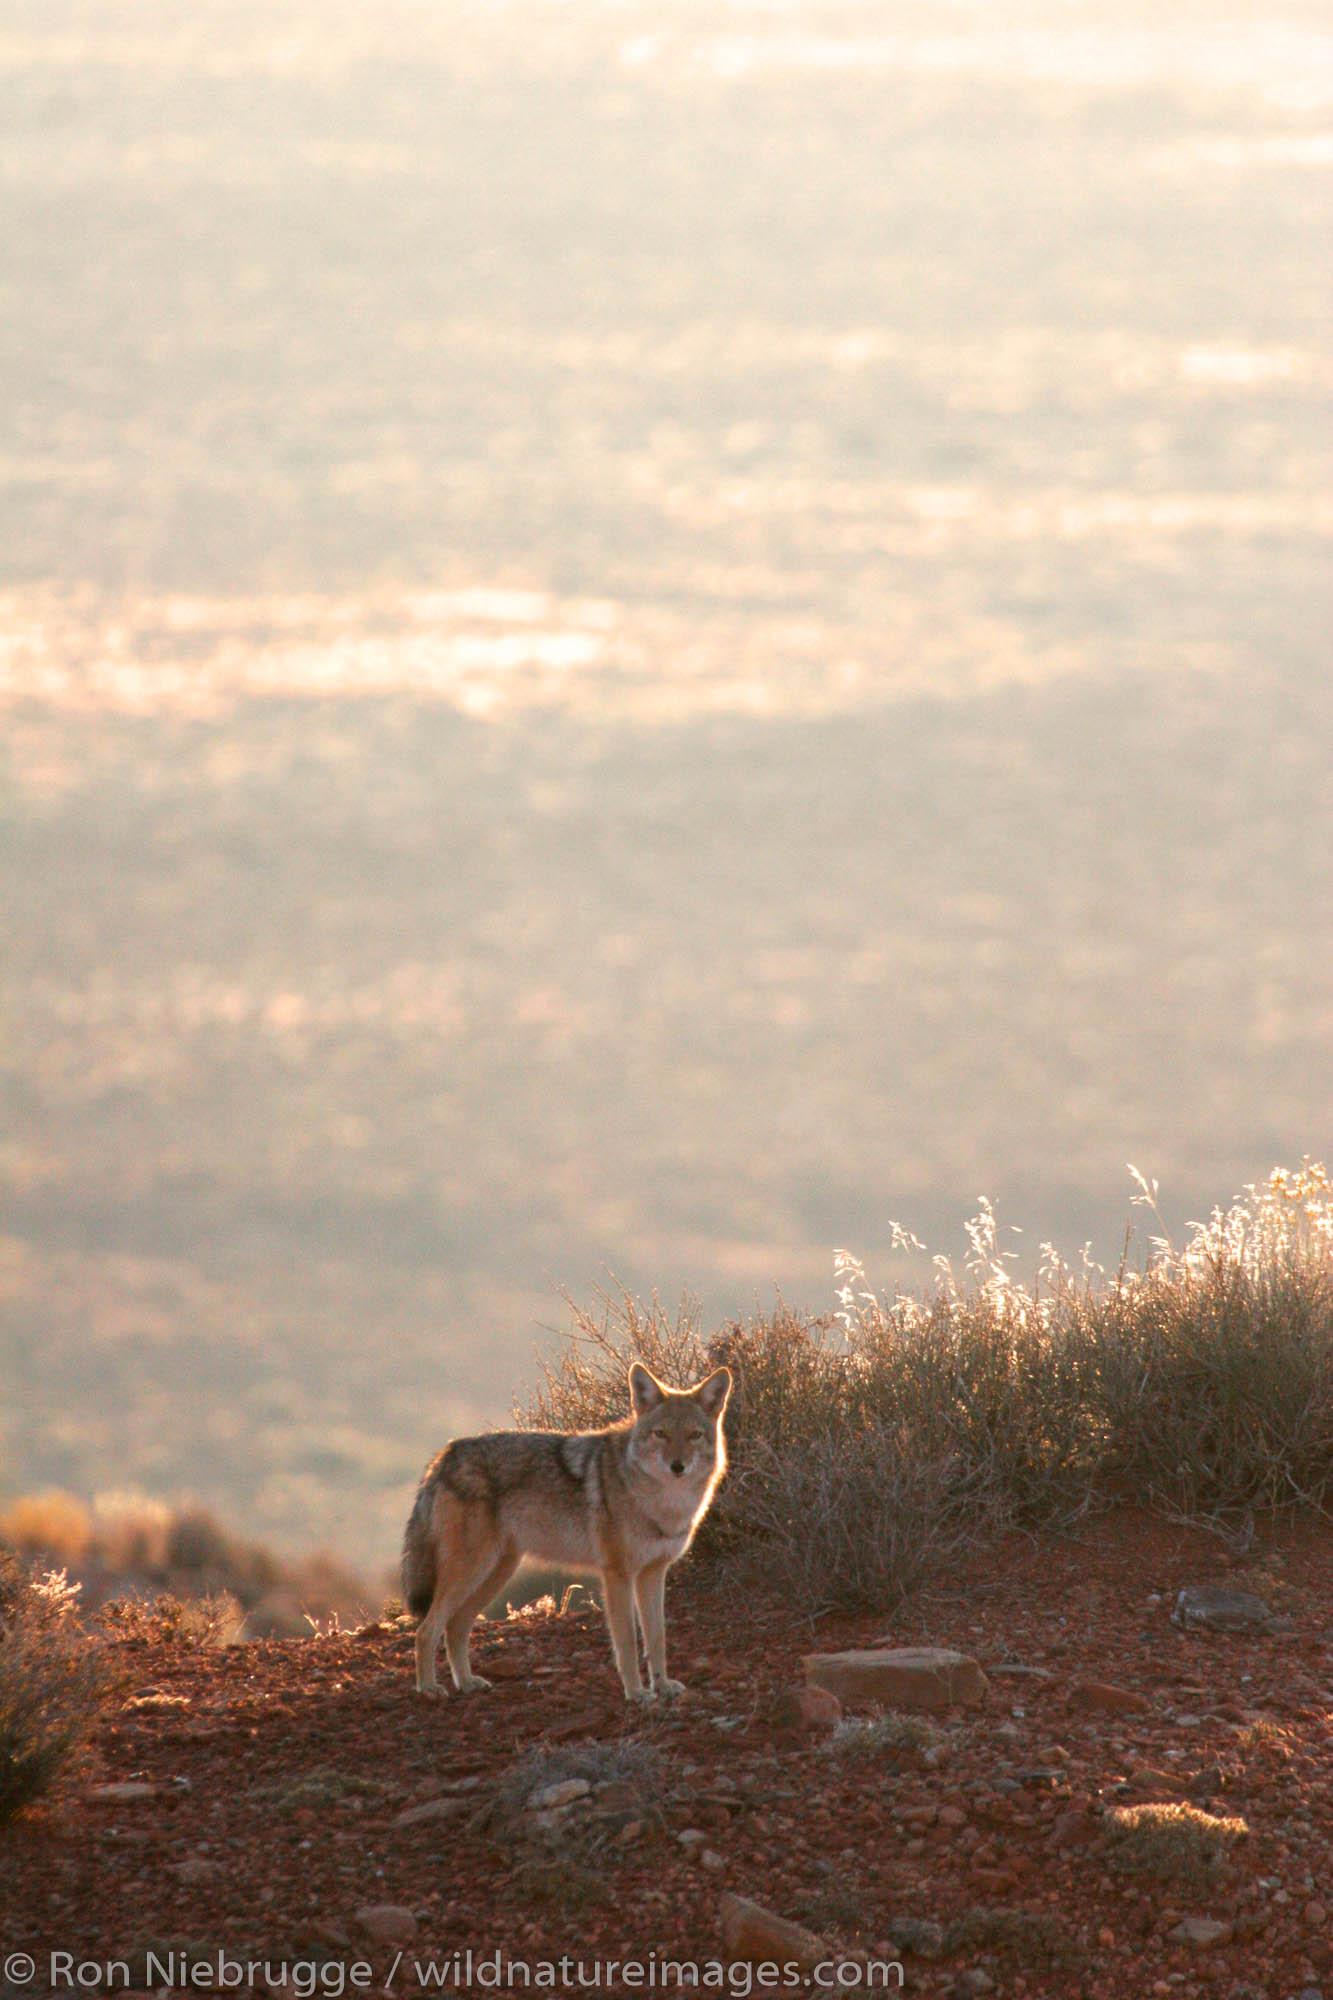 Coyote in Monument Valley Navajo Tribal Park, Utah.